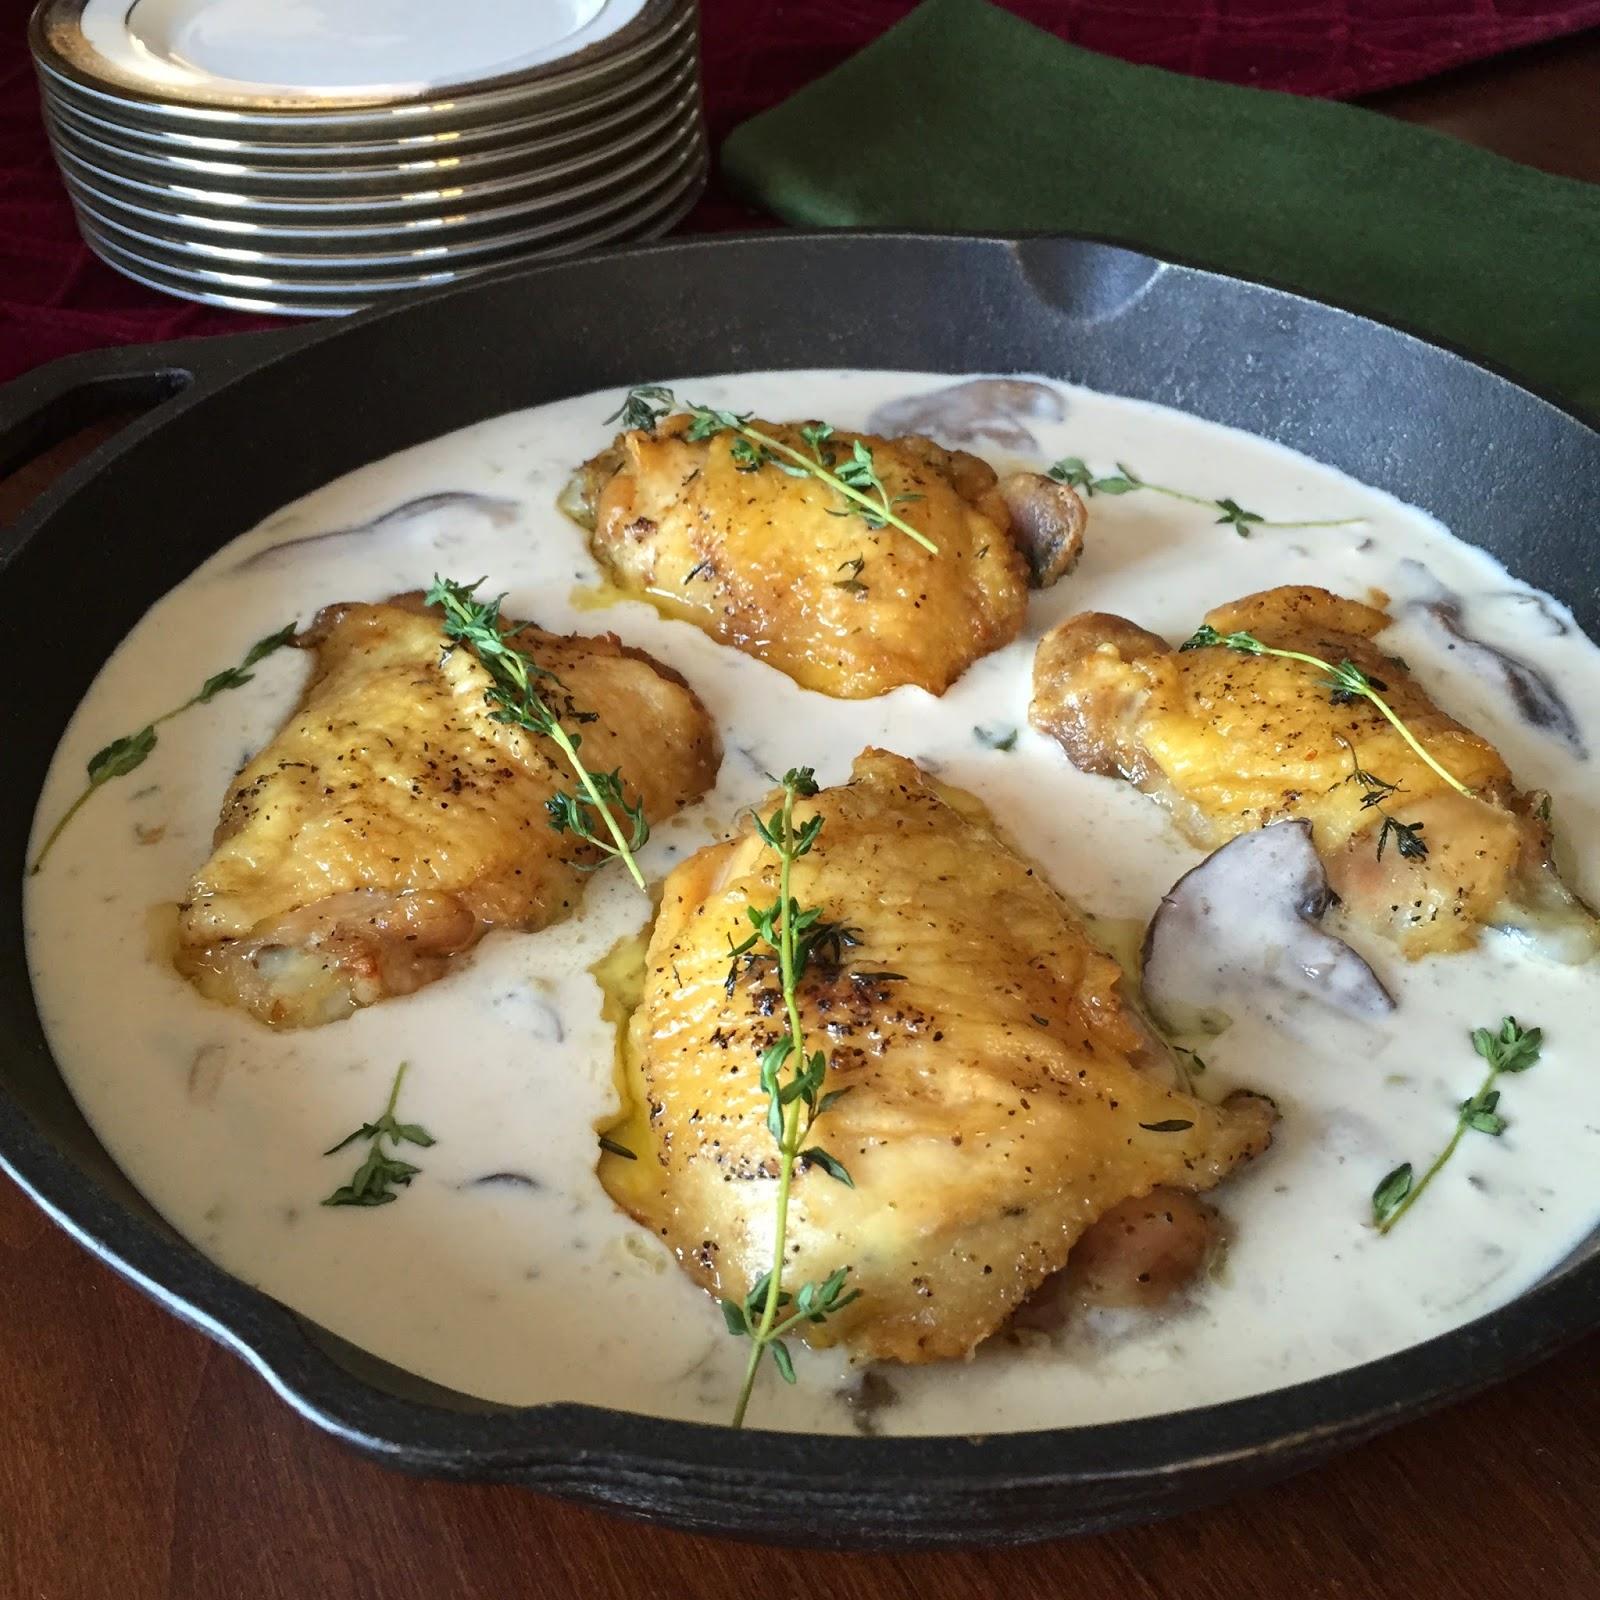 Food Impressions: Wild Mushroom Cream Sauce Over Chicken